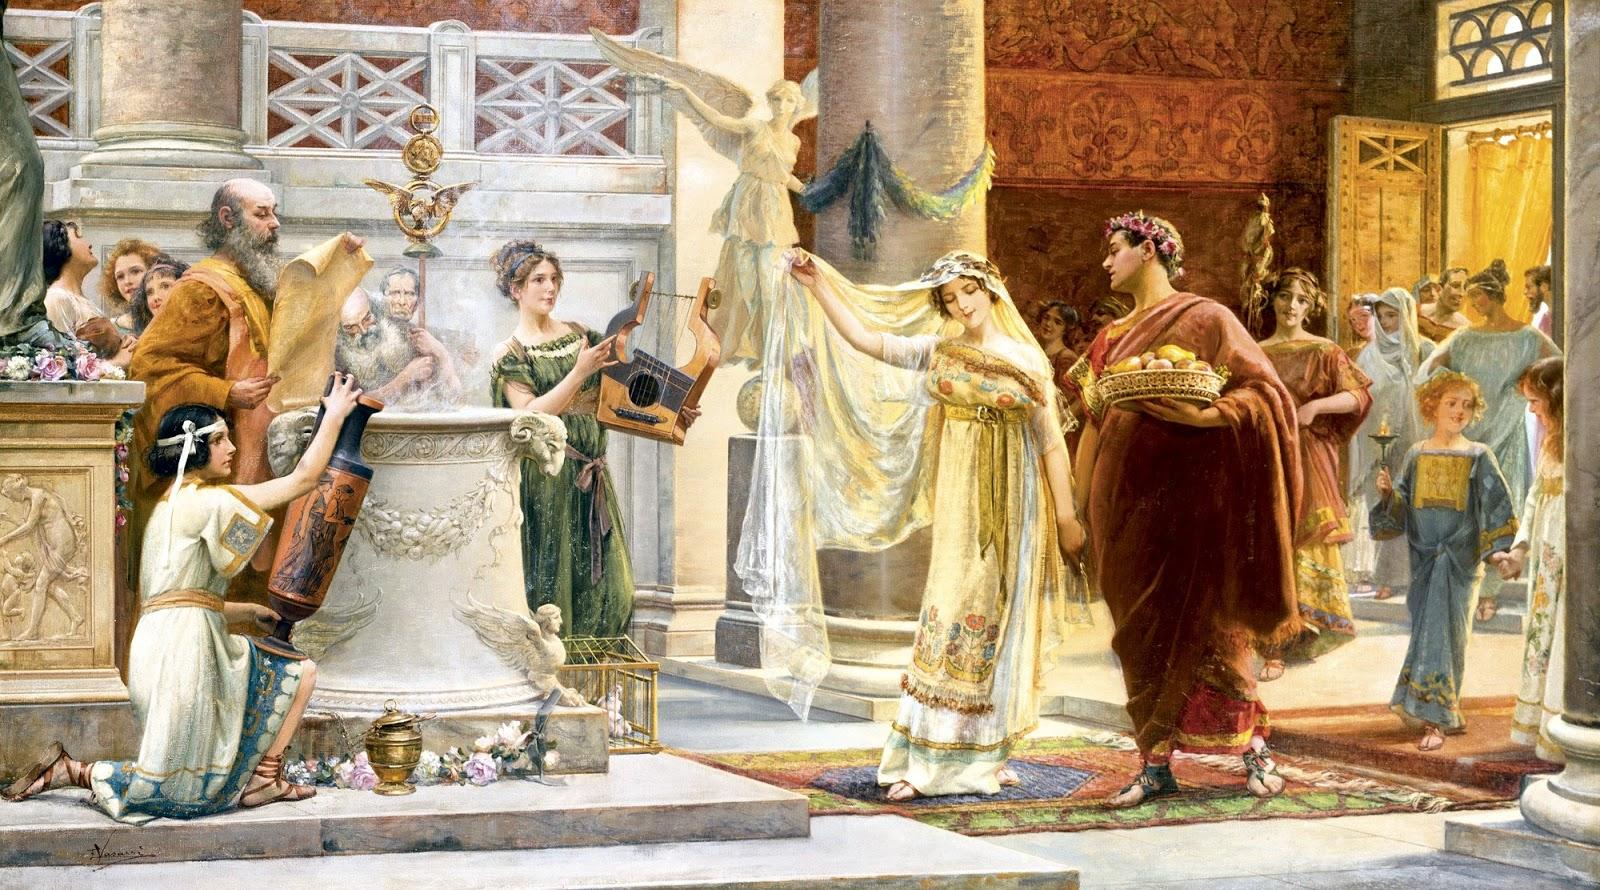 Matrimonio Romano Concepto : Arraona romana un projecte de difusió la cultura